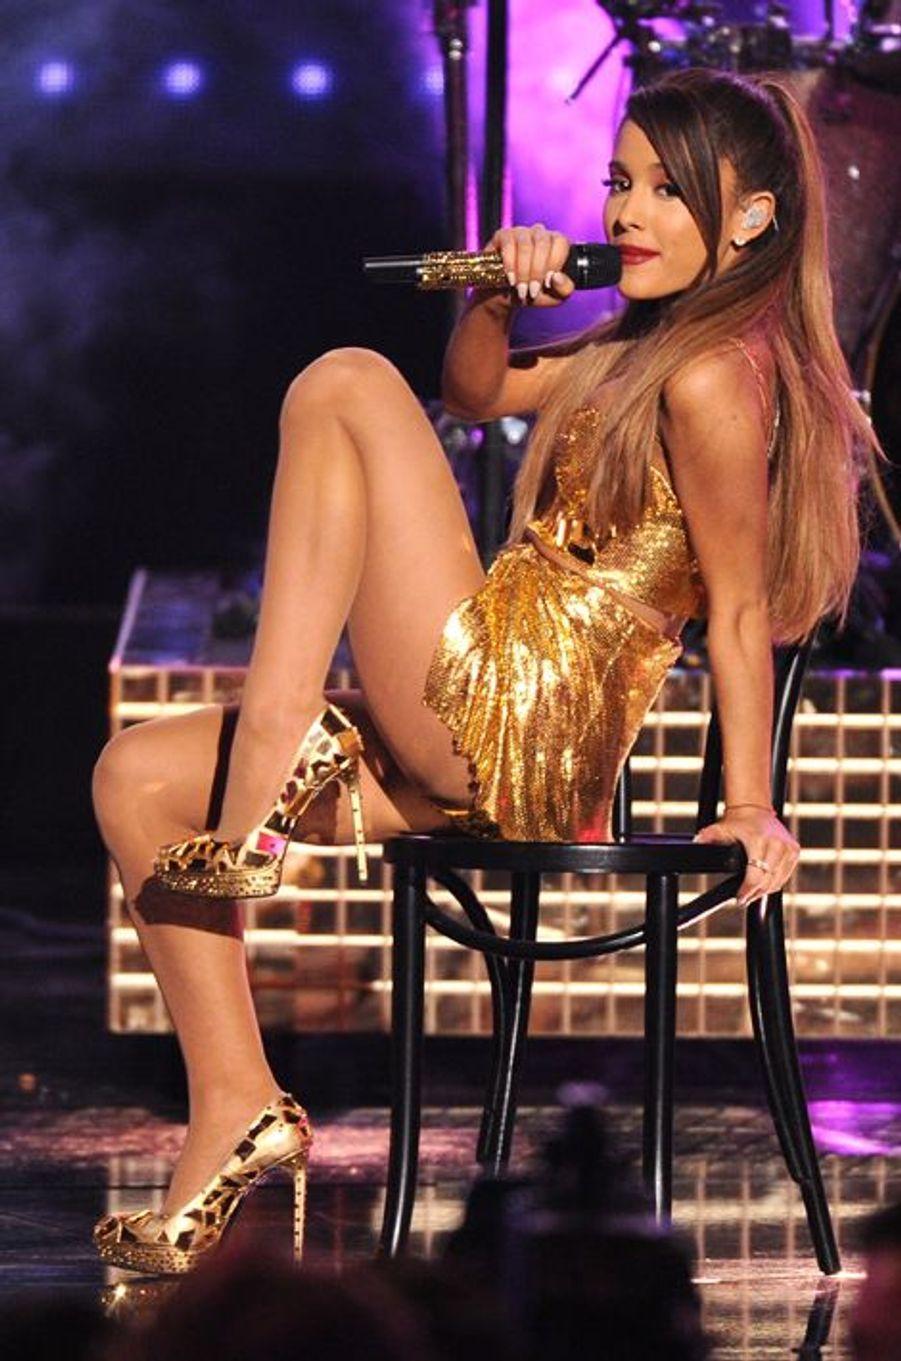 Ariana Grande à Los Angeles le 23 novembre 2014